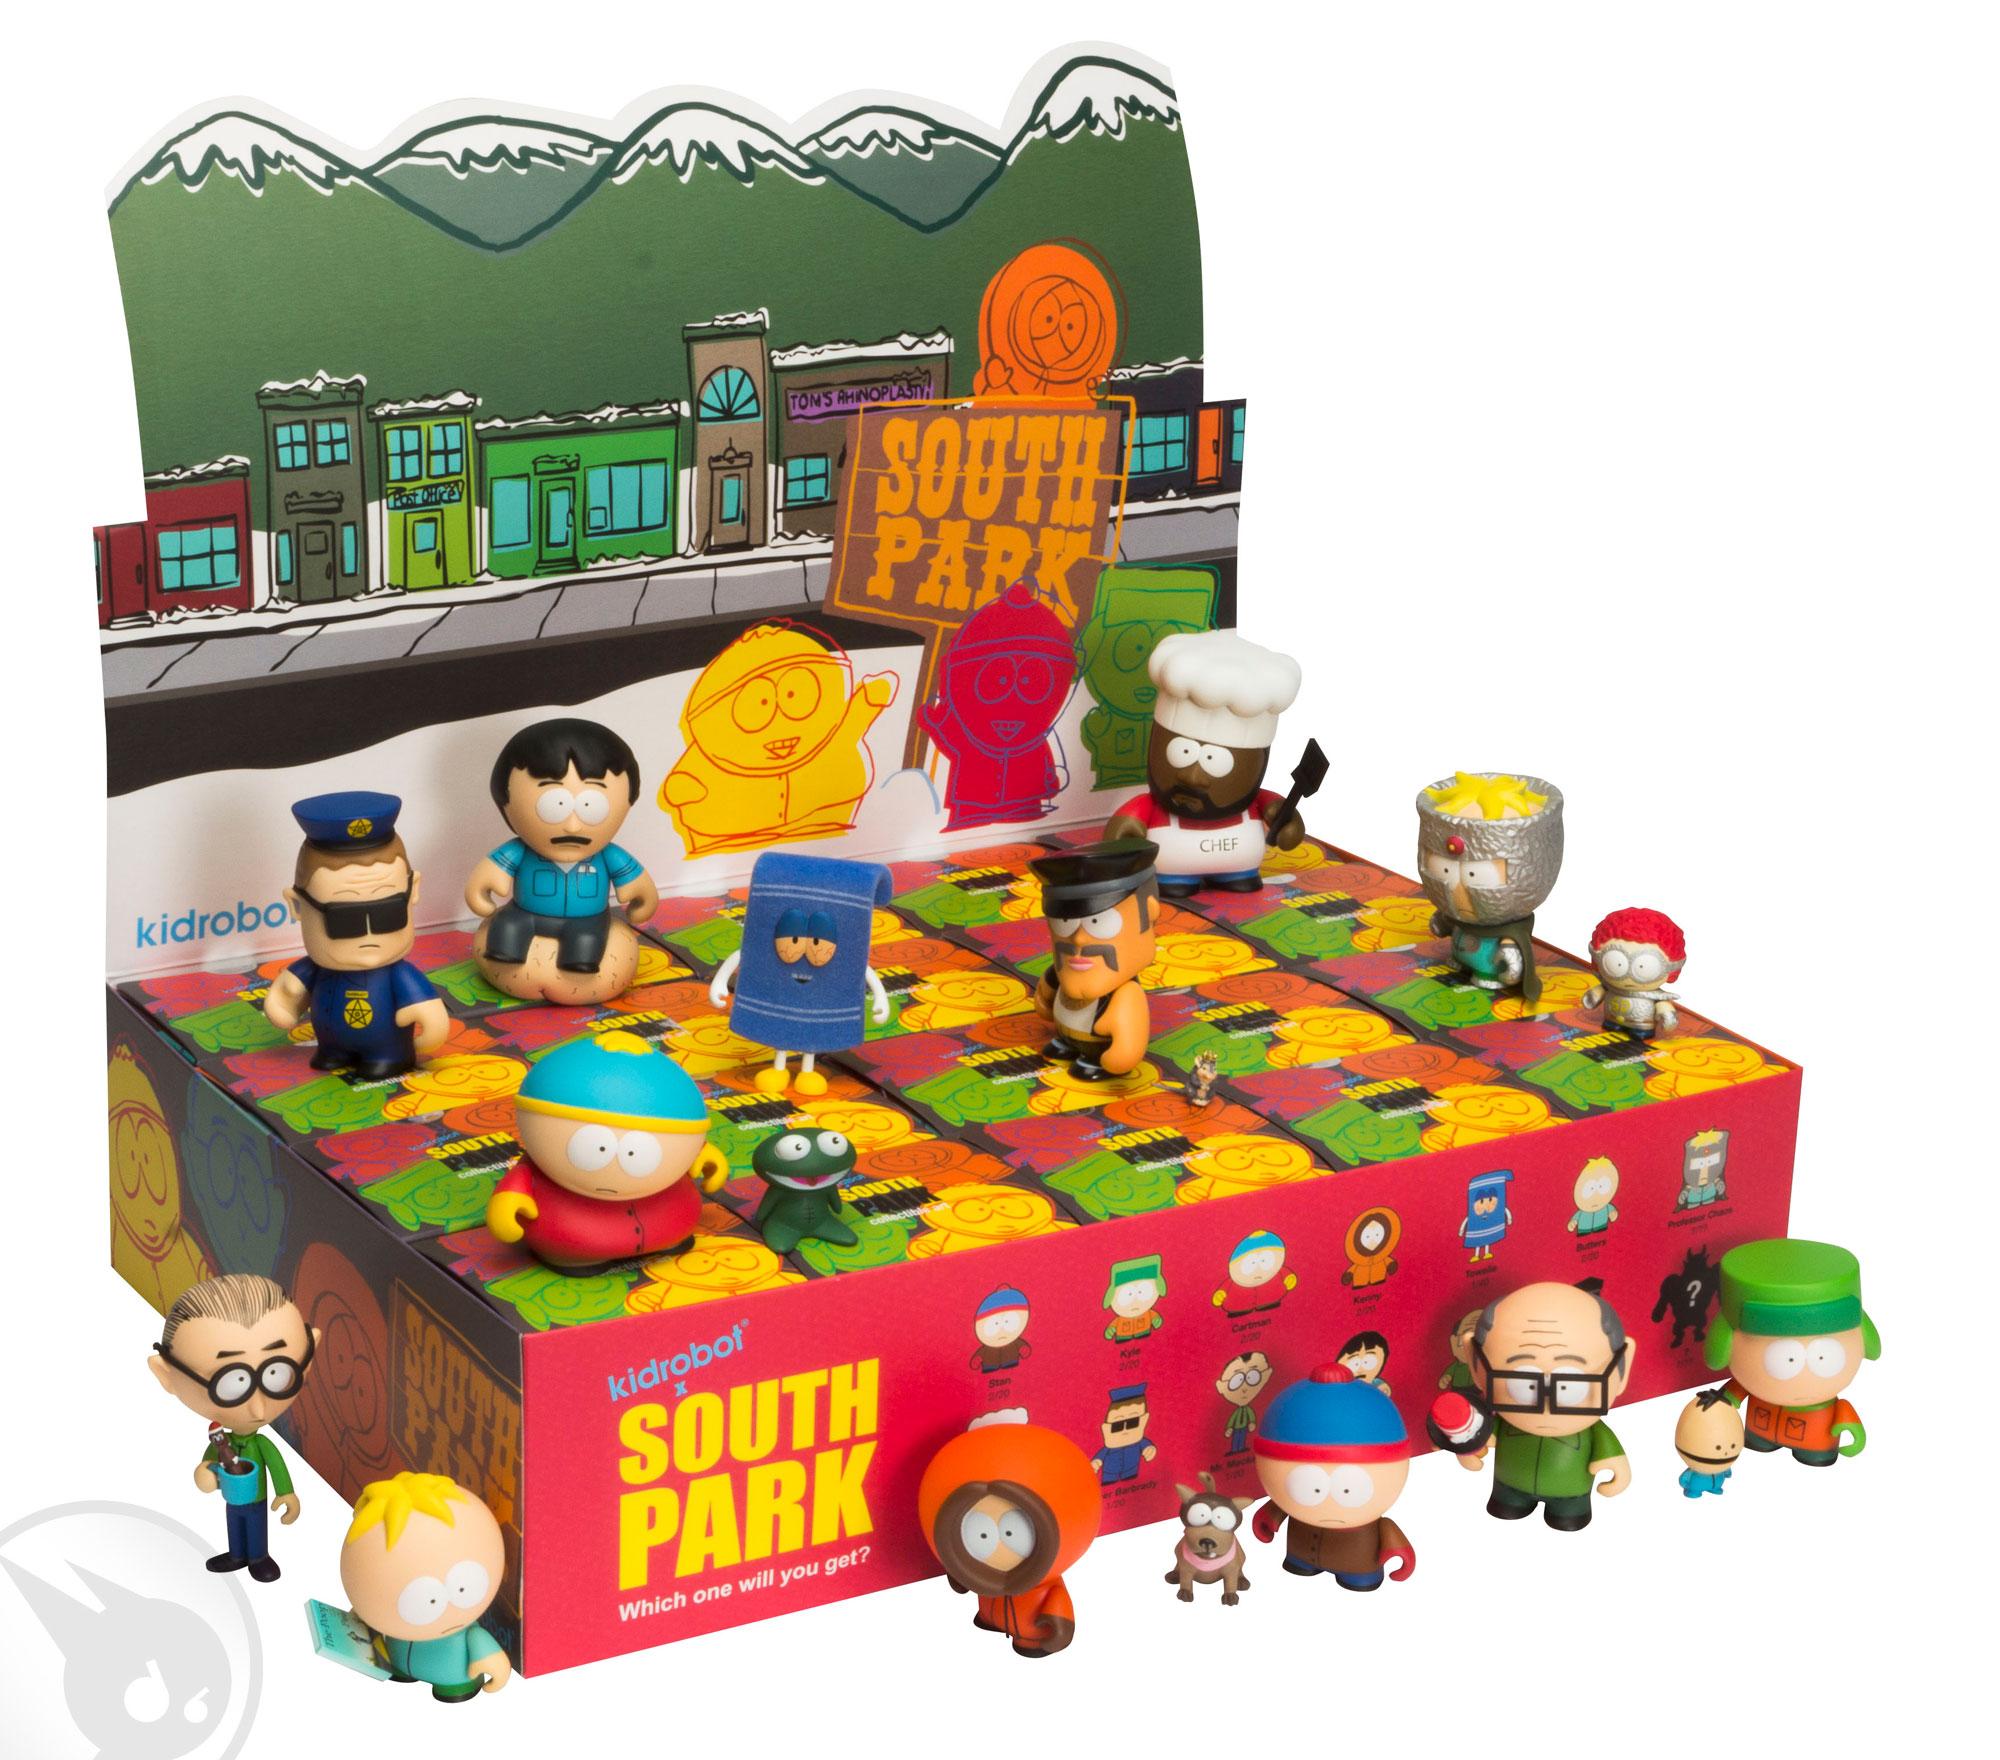 RARE!!! Kidrobot South Park Series 1 Zipper Pull Professor Chaos Chase